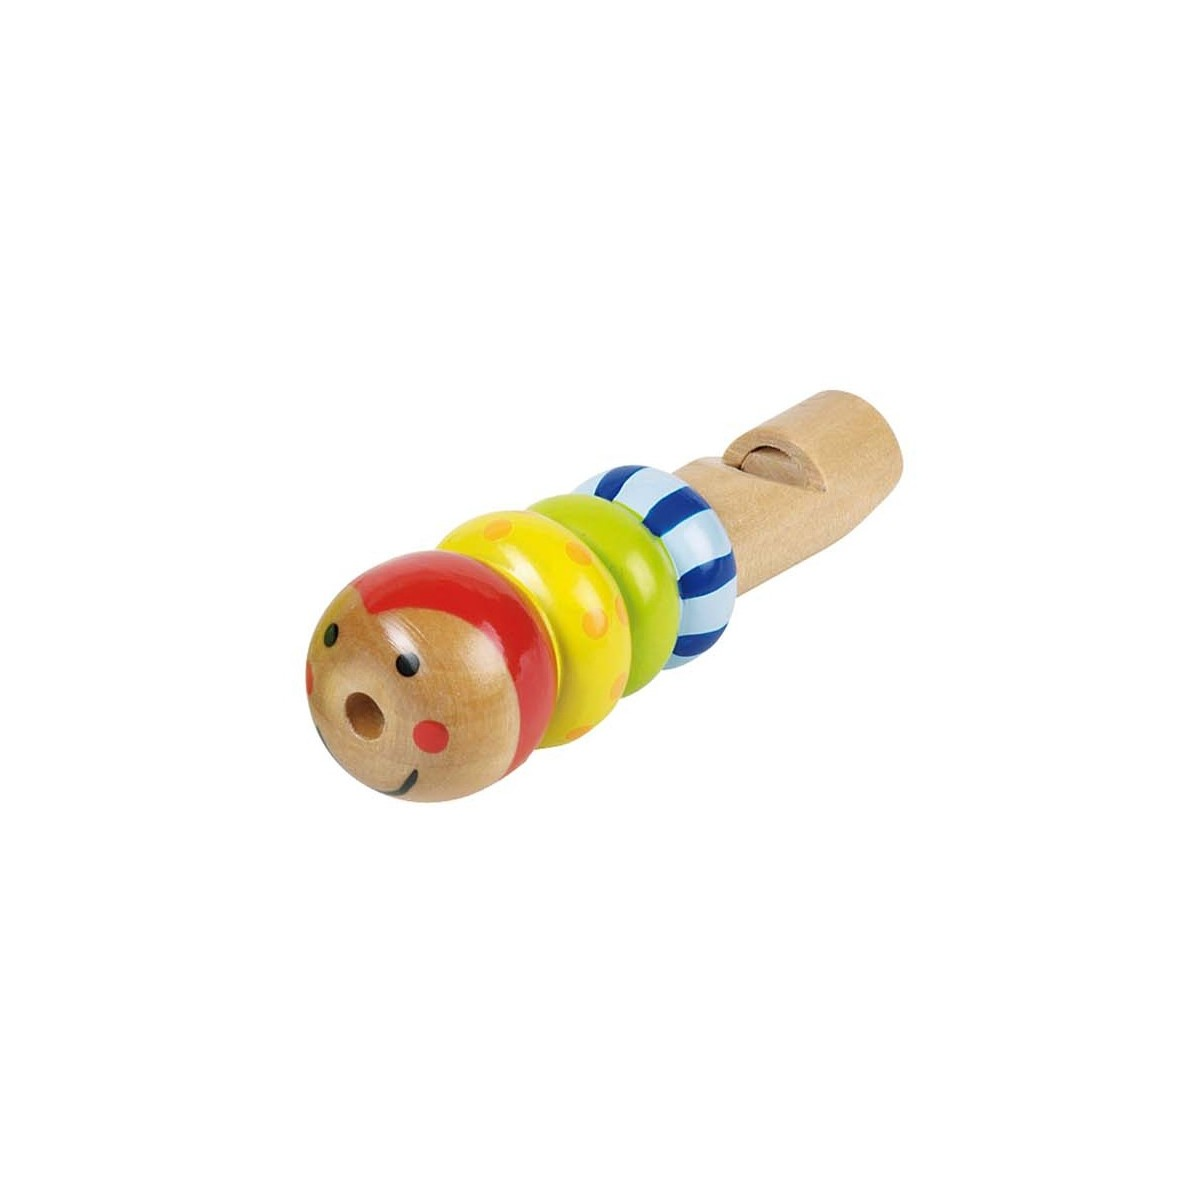 Sifflet chenille en bois peint